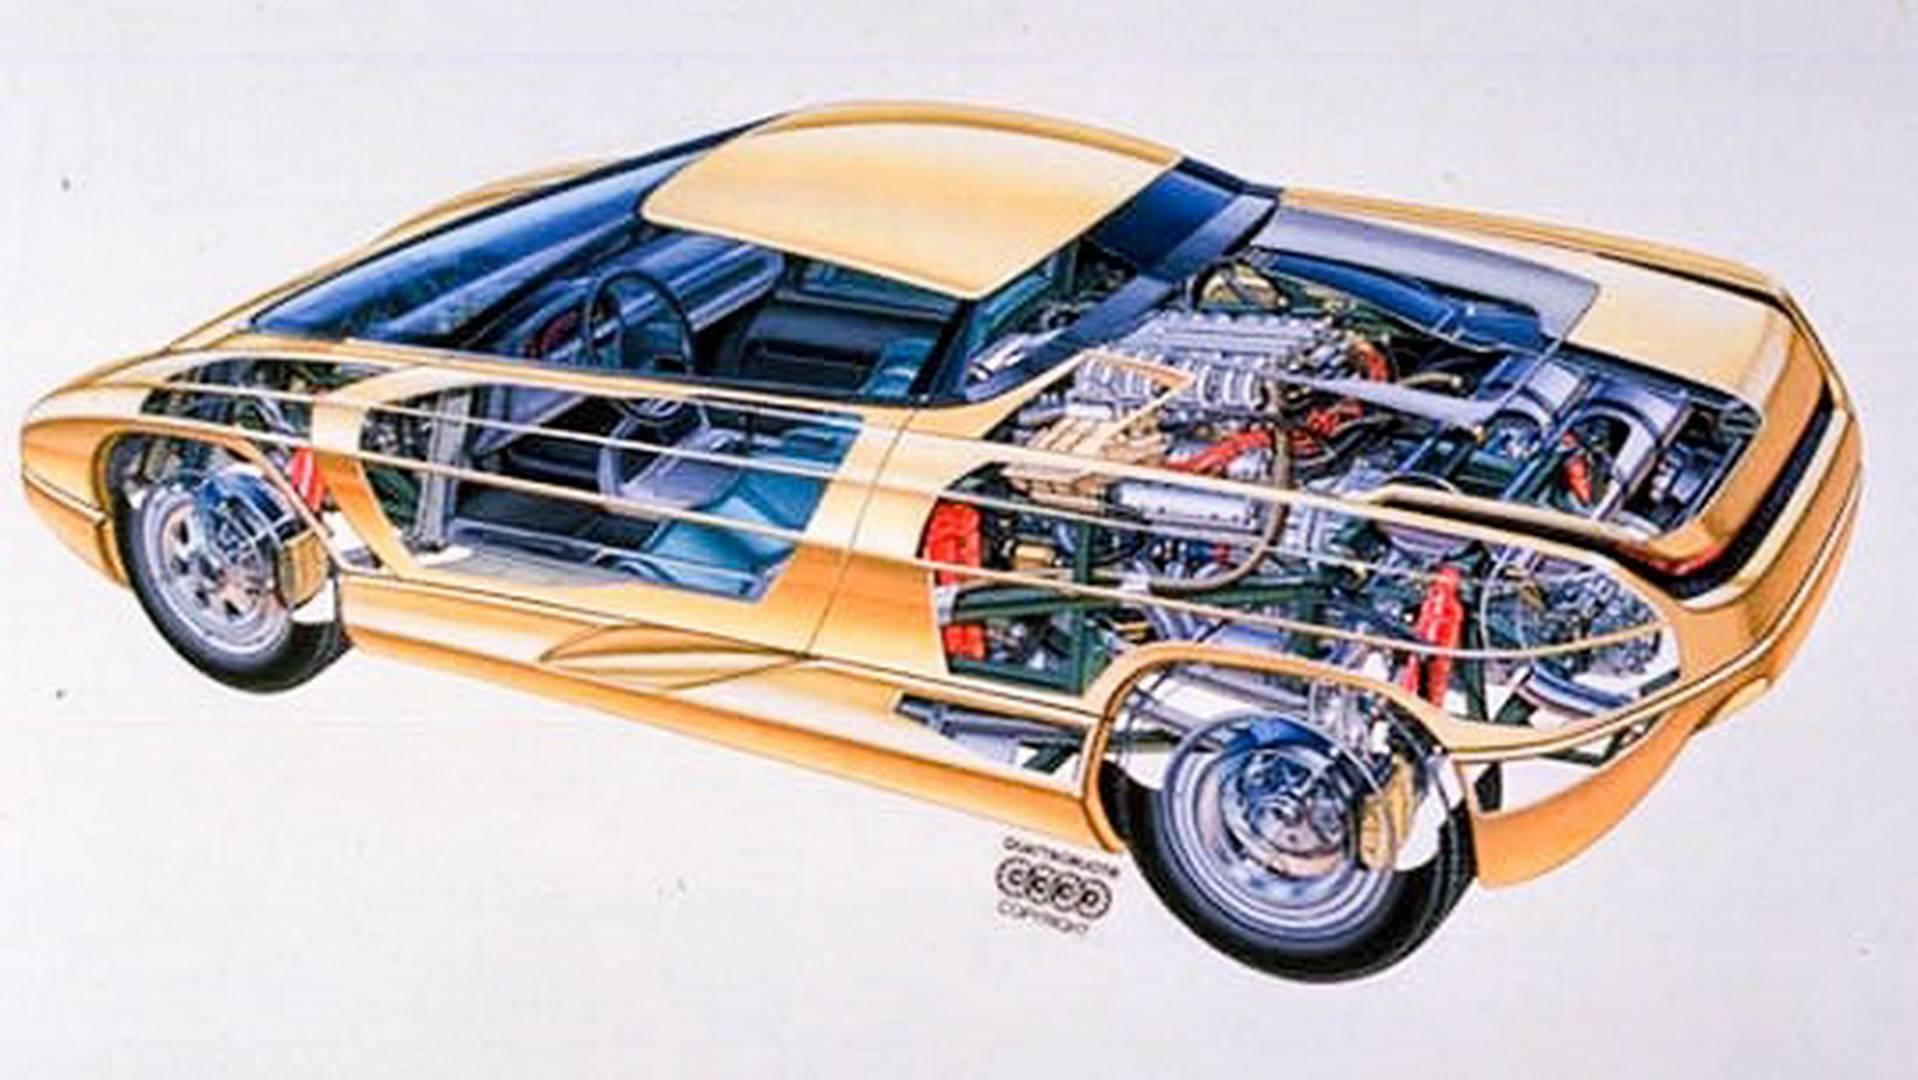 1990 Bertone Nivola concept cutaway